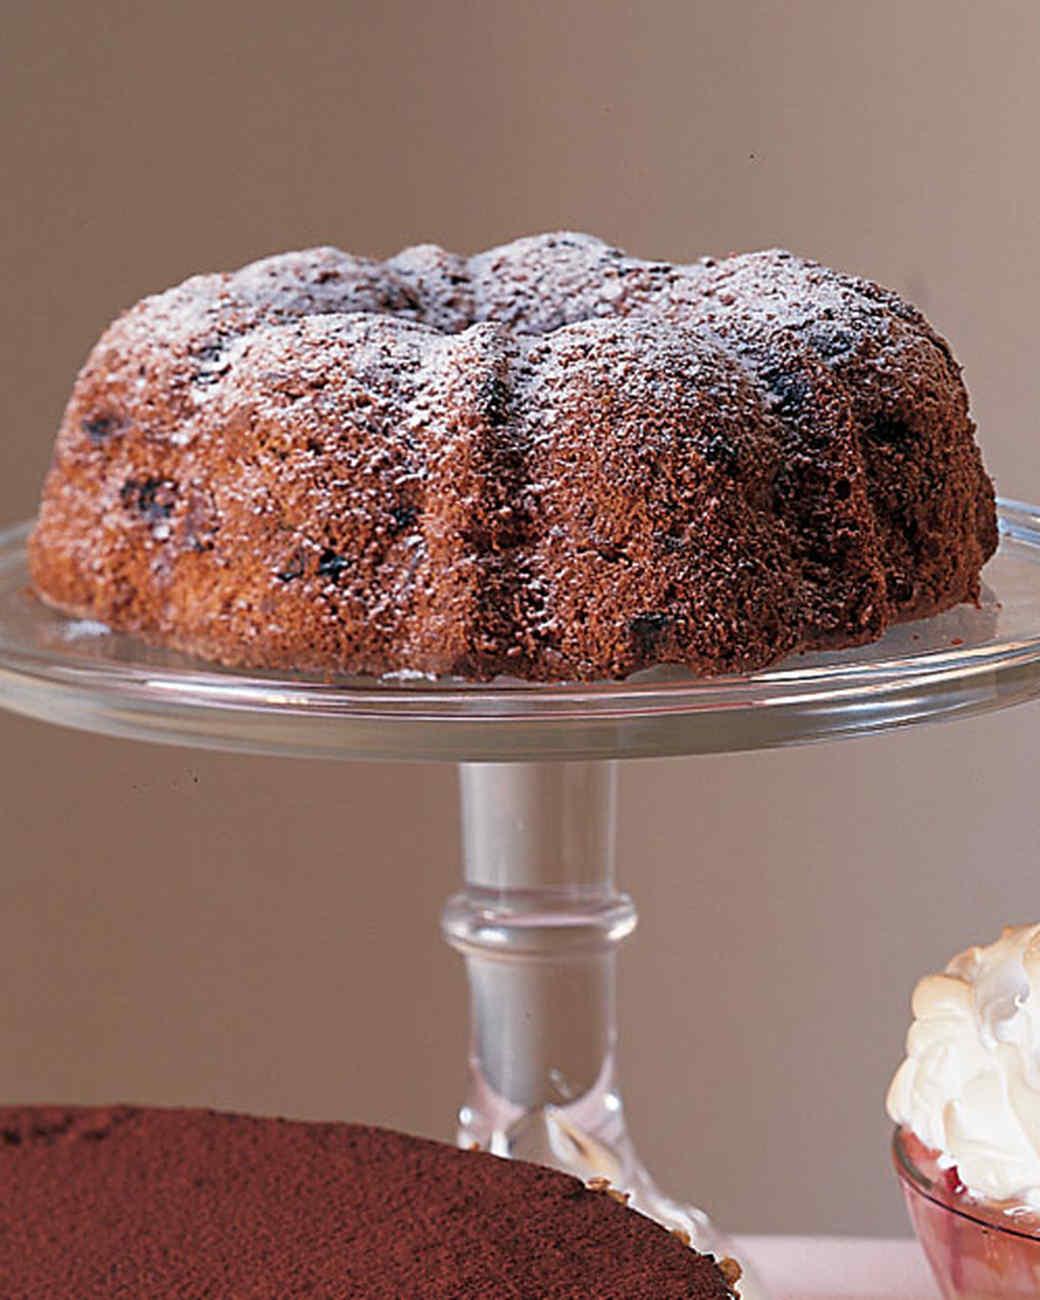 cakes_01422_t.jpg